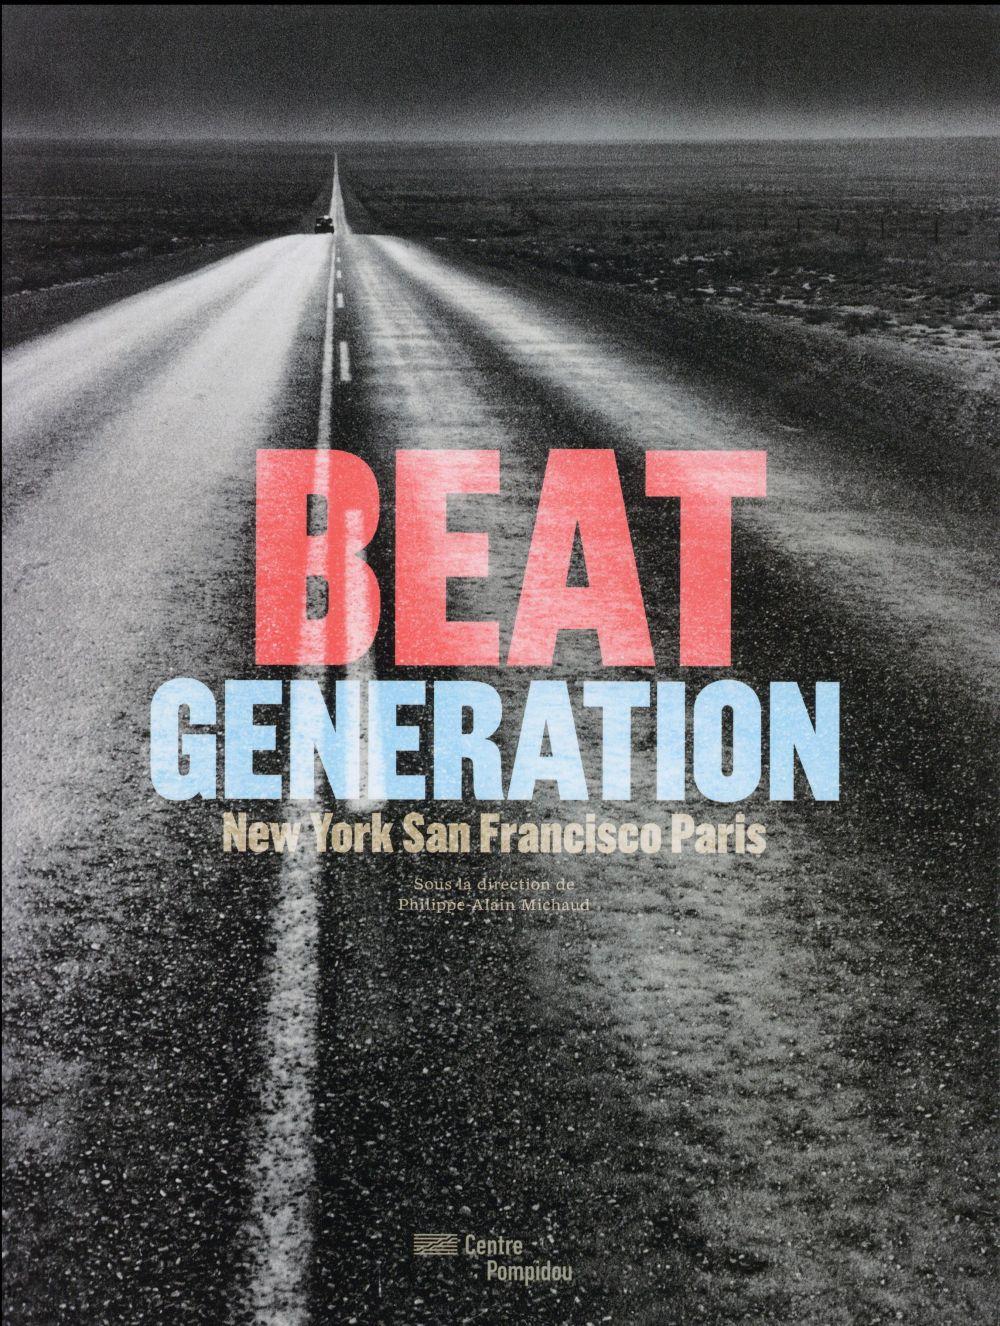 Beat Generation, New York, San Francisco, Paris